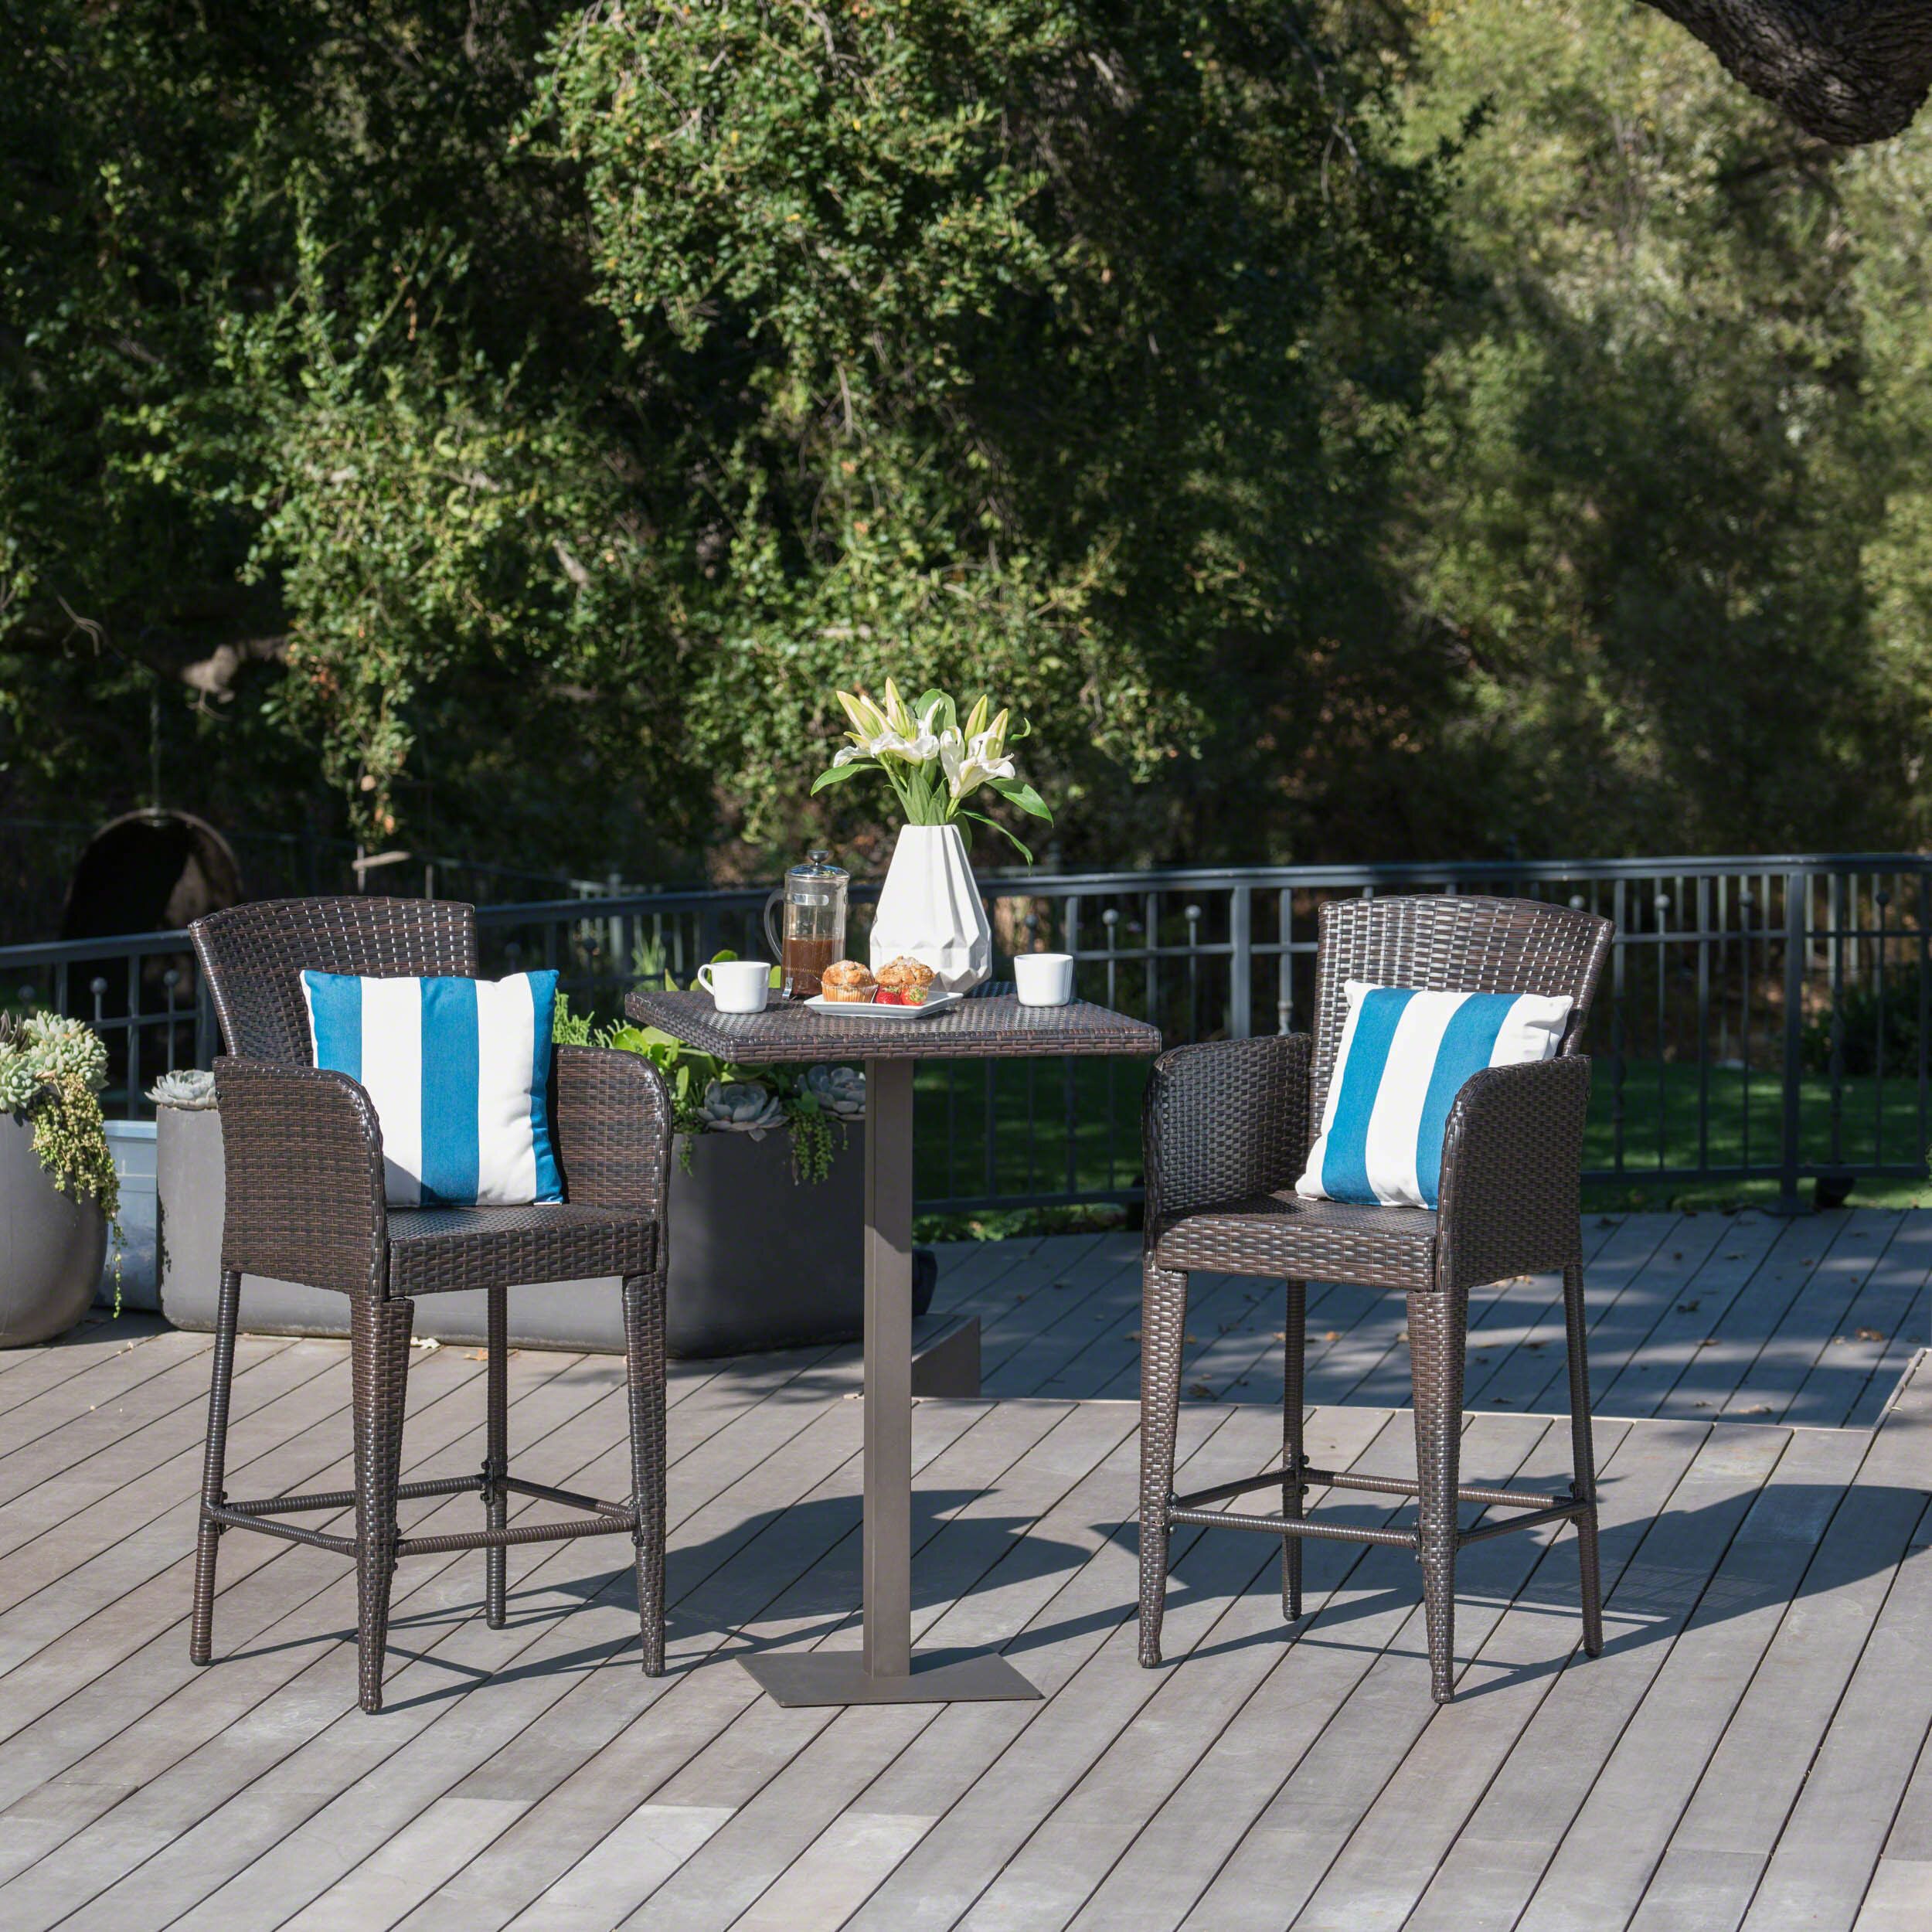 Outstanding Waldhaus 3 Piece Bar Height Dining Set Uwap Interior Chair Design Uwaporg